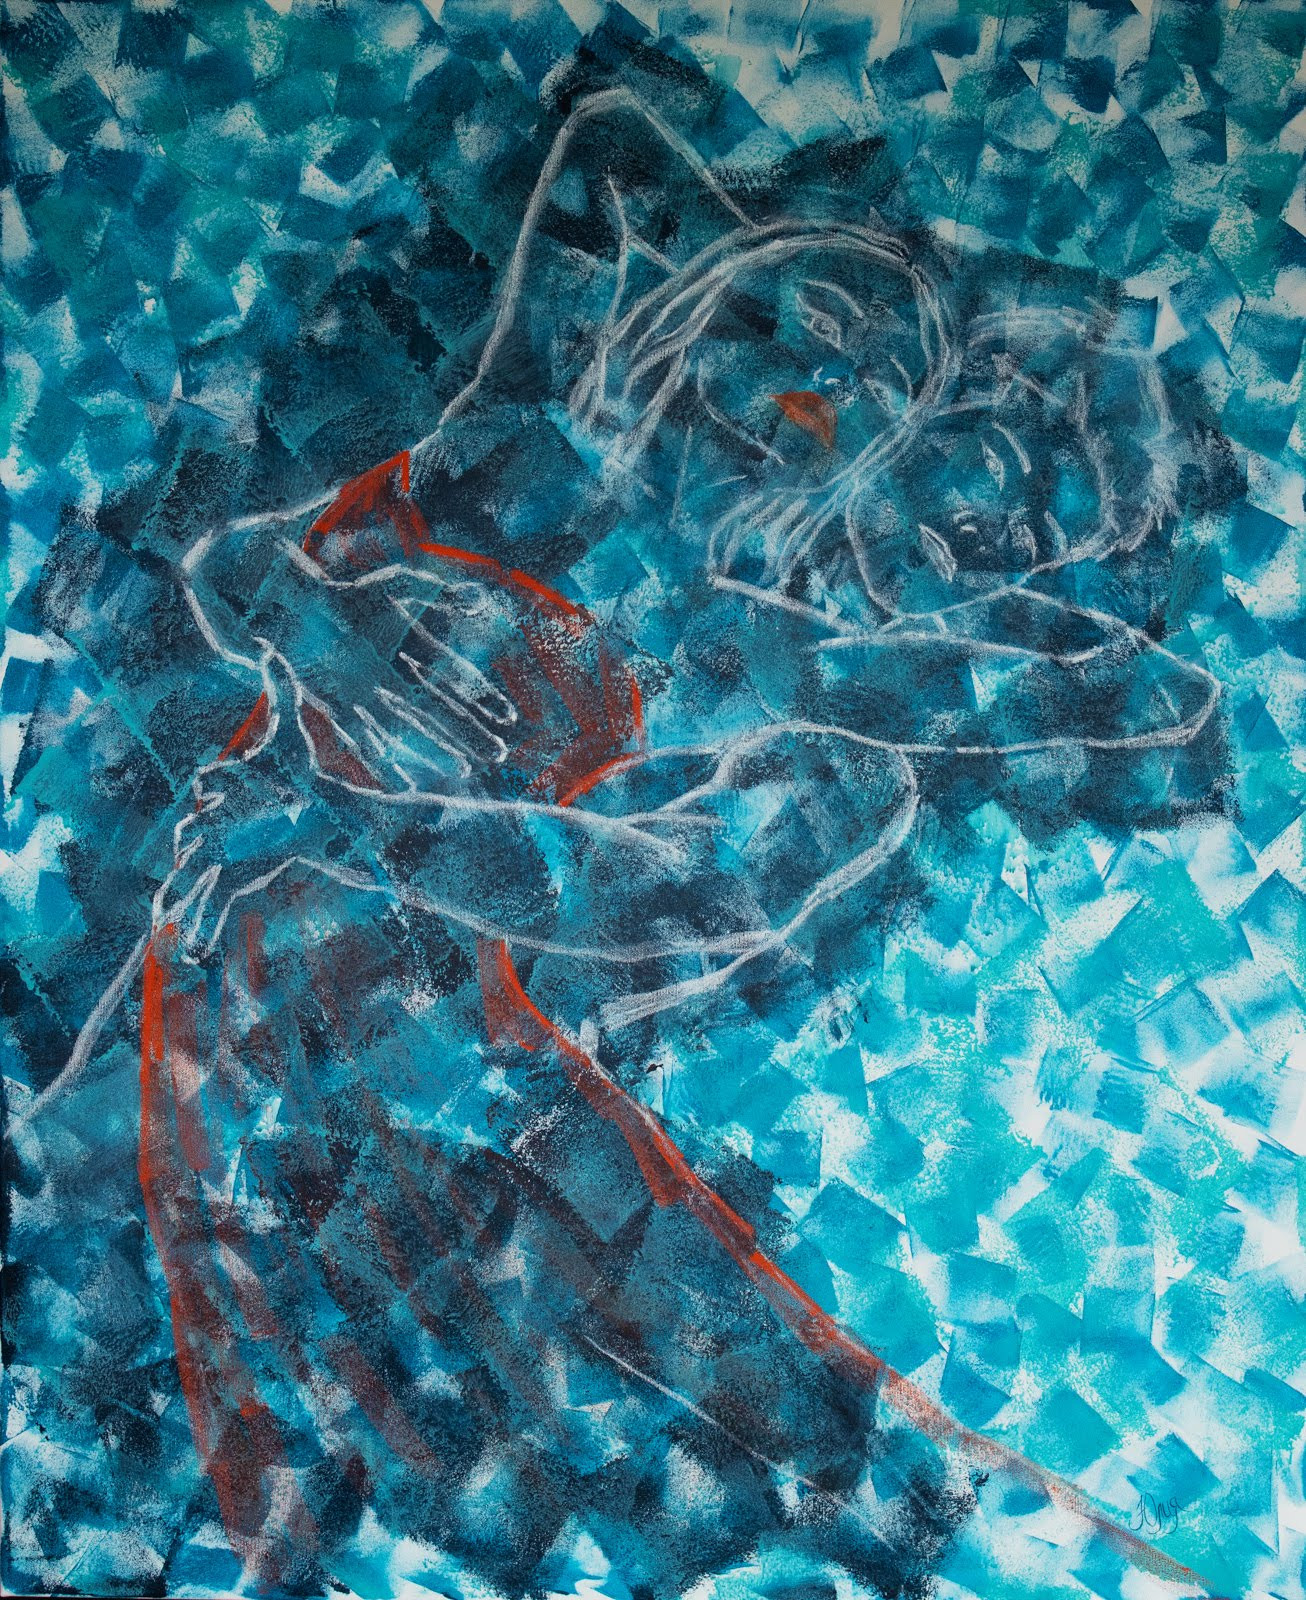 Oil pastel, acrylic on canvas, 100x120 cm